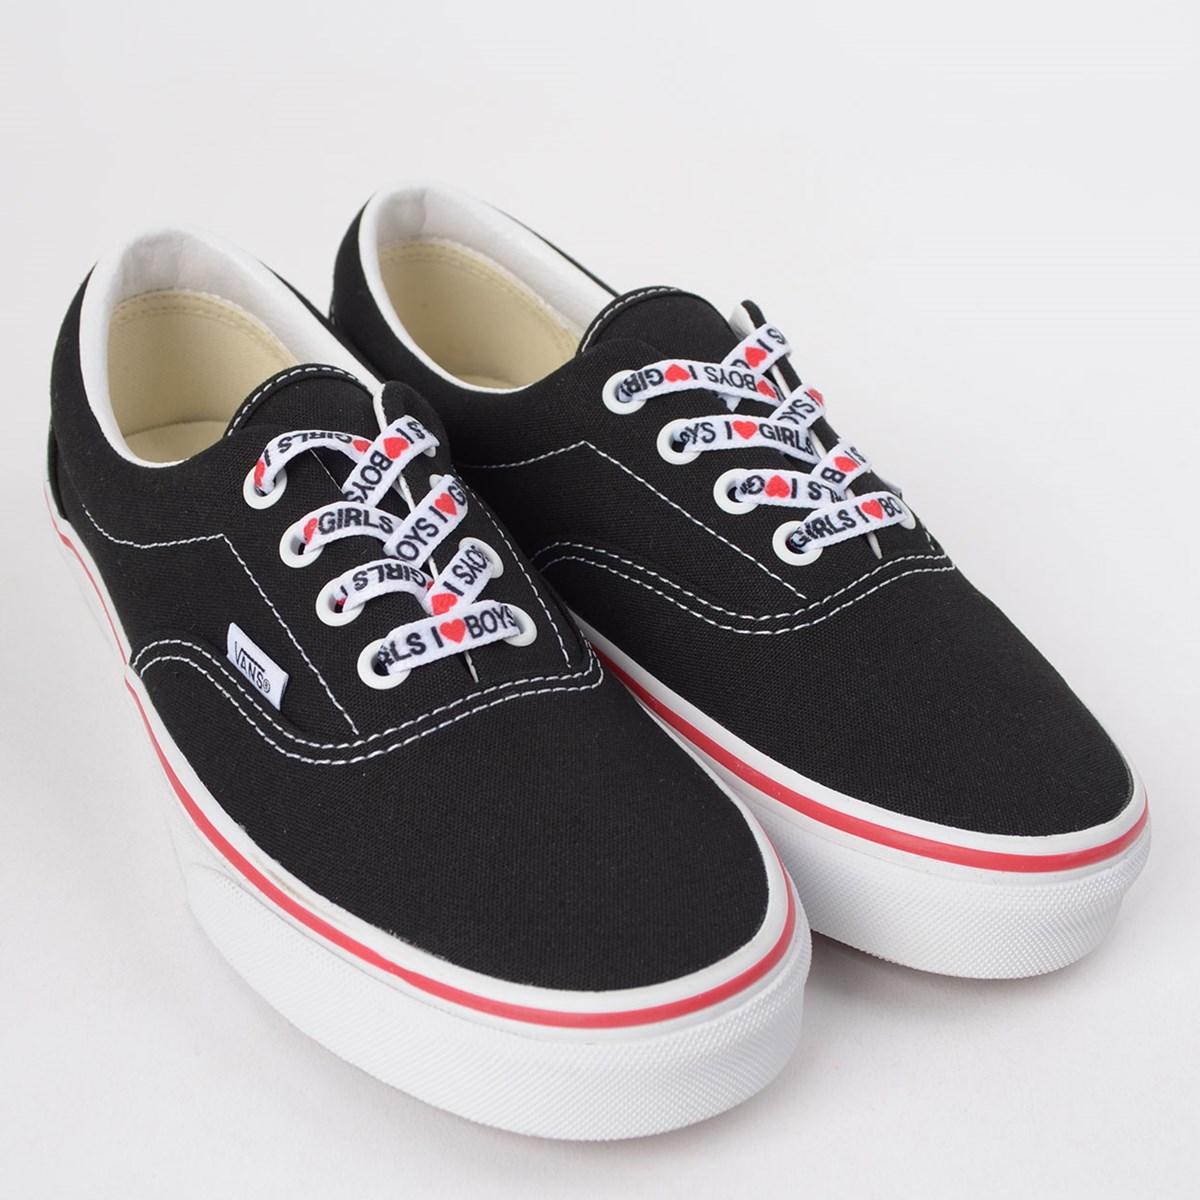 Tênis Vans Era I Heart Black True White VN0A4U39WKU